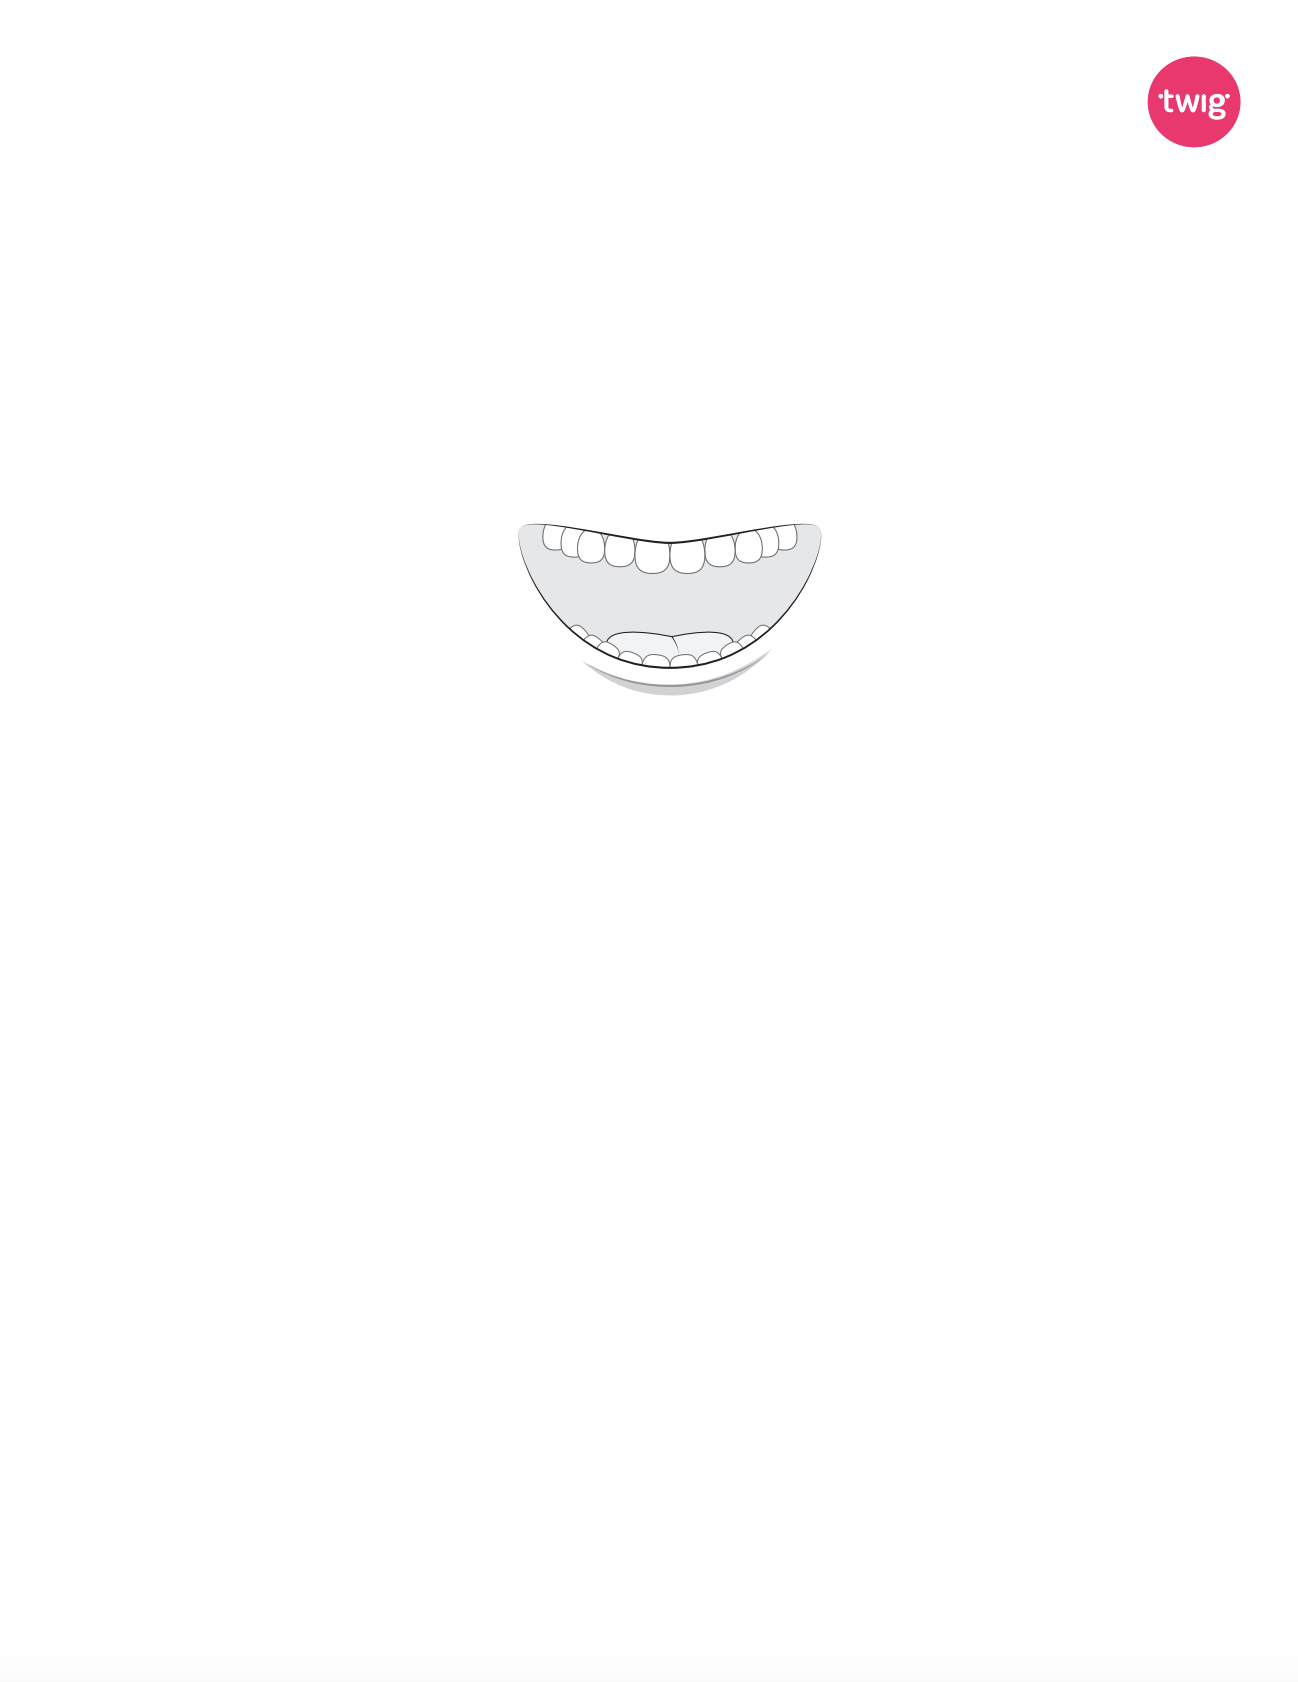 Mouth cutout